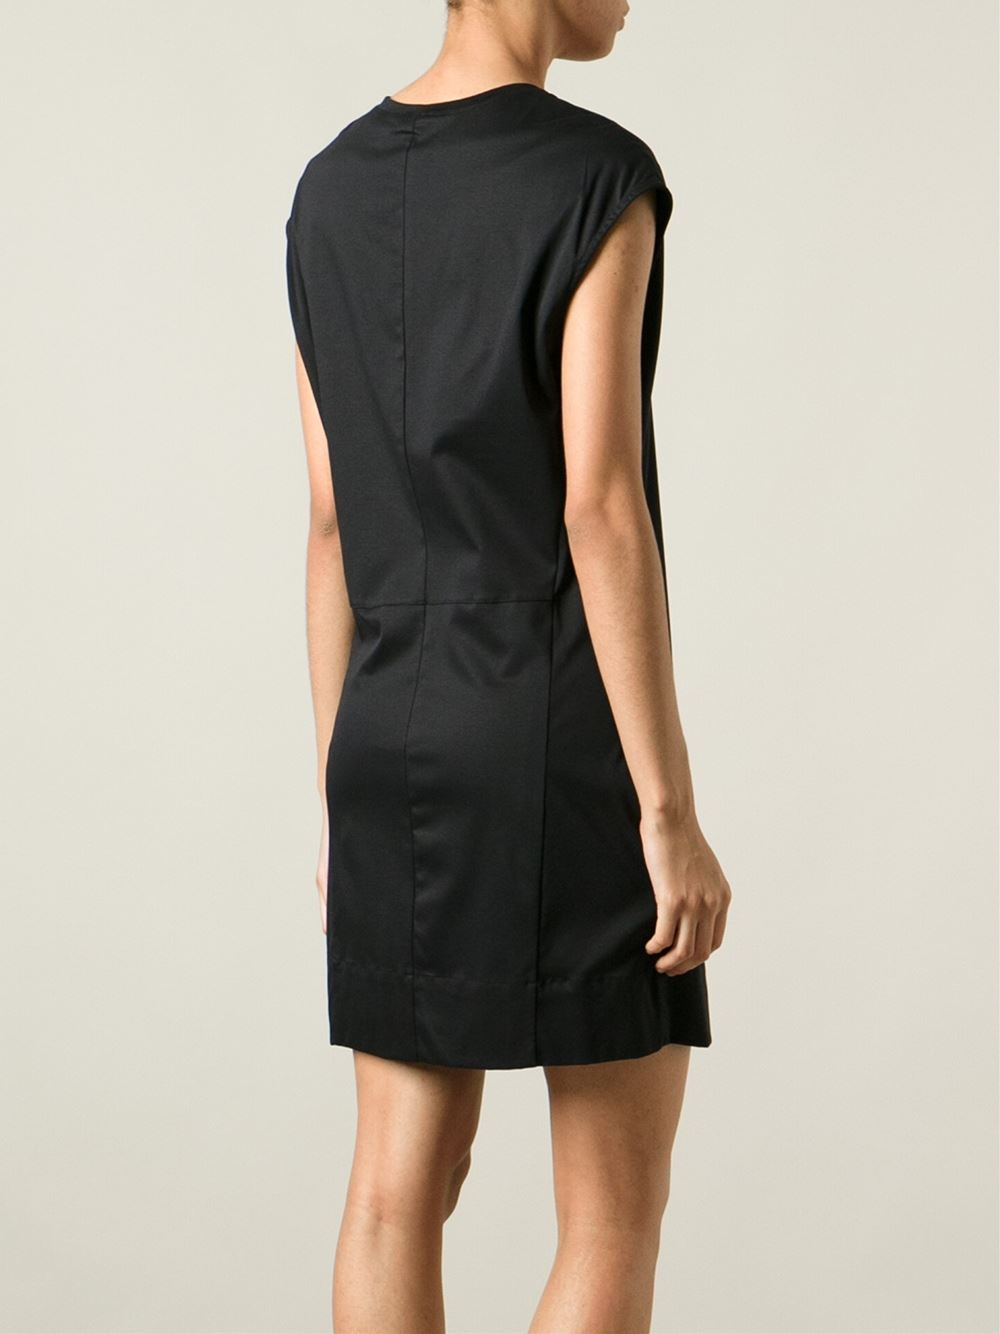 Helmut Lang Jersey T Shirt Dress In Black Lyst